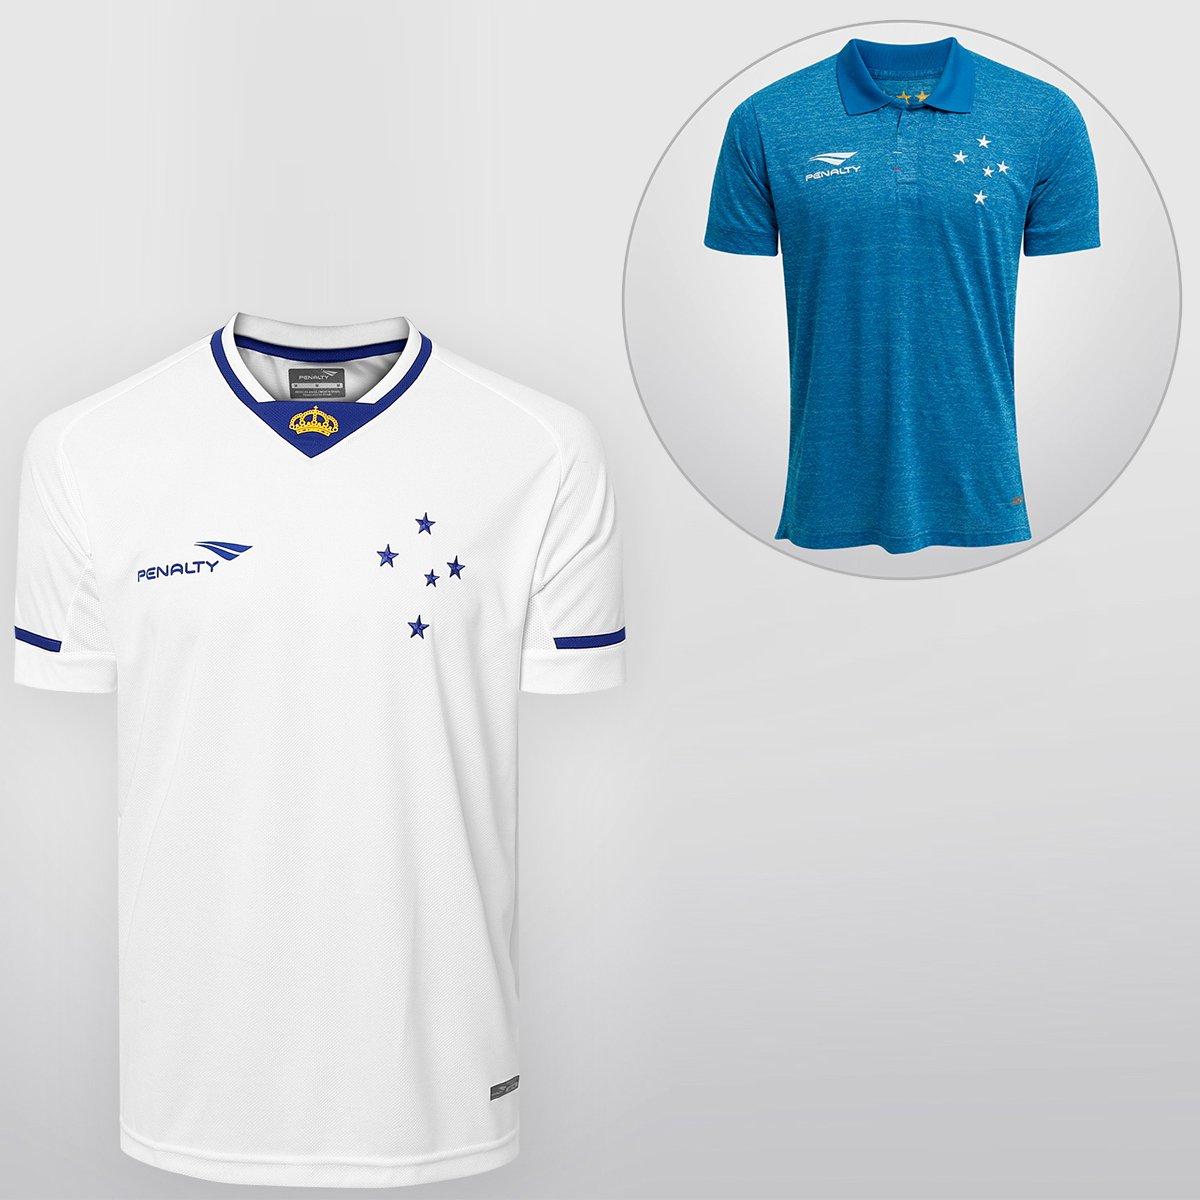 Kit Penalty Cruzeiro - Camisa II 15 16 s nº + Camisa III 15 16 s nº - Compre  Agora  3e61604656bc7